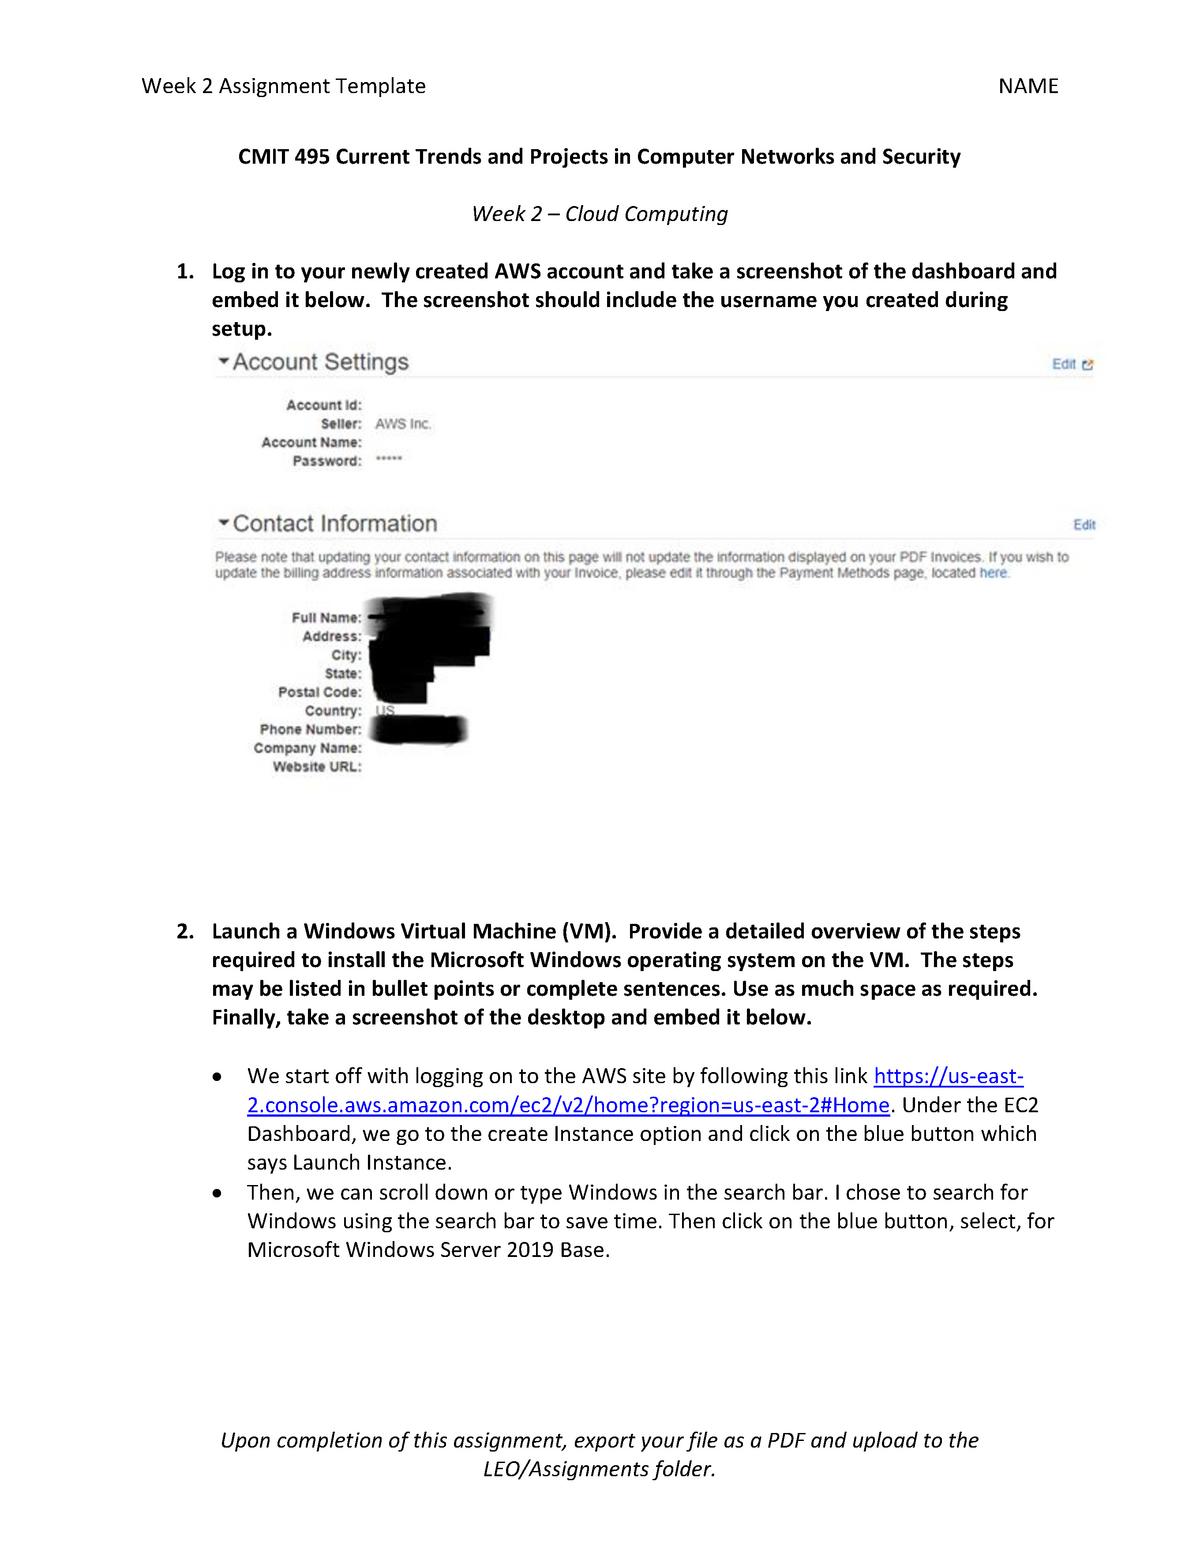 CMIT495 - Assignment 2 - CMIT 495 - UMUC - StuDocu